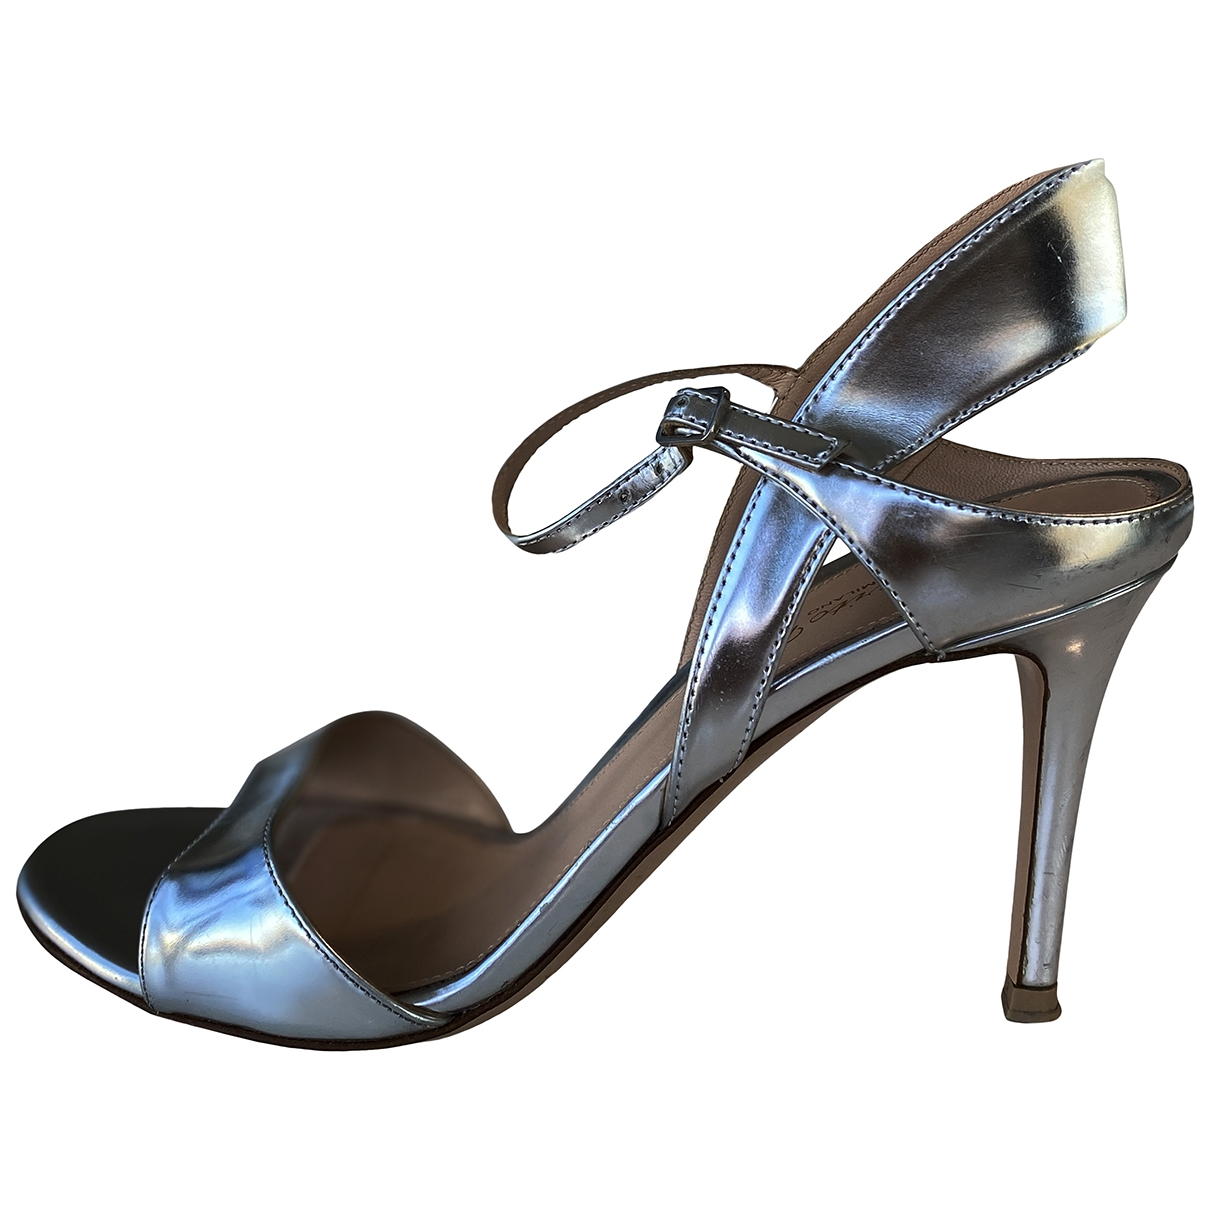 Gianvito Rossi - Escarpins   pour femme en cuir verni - argente